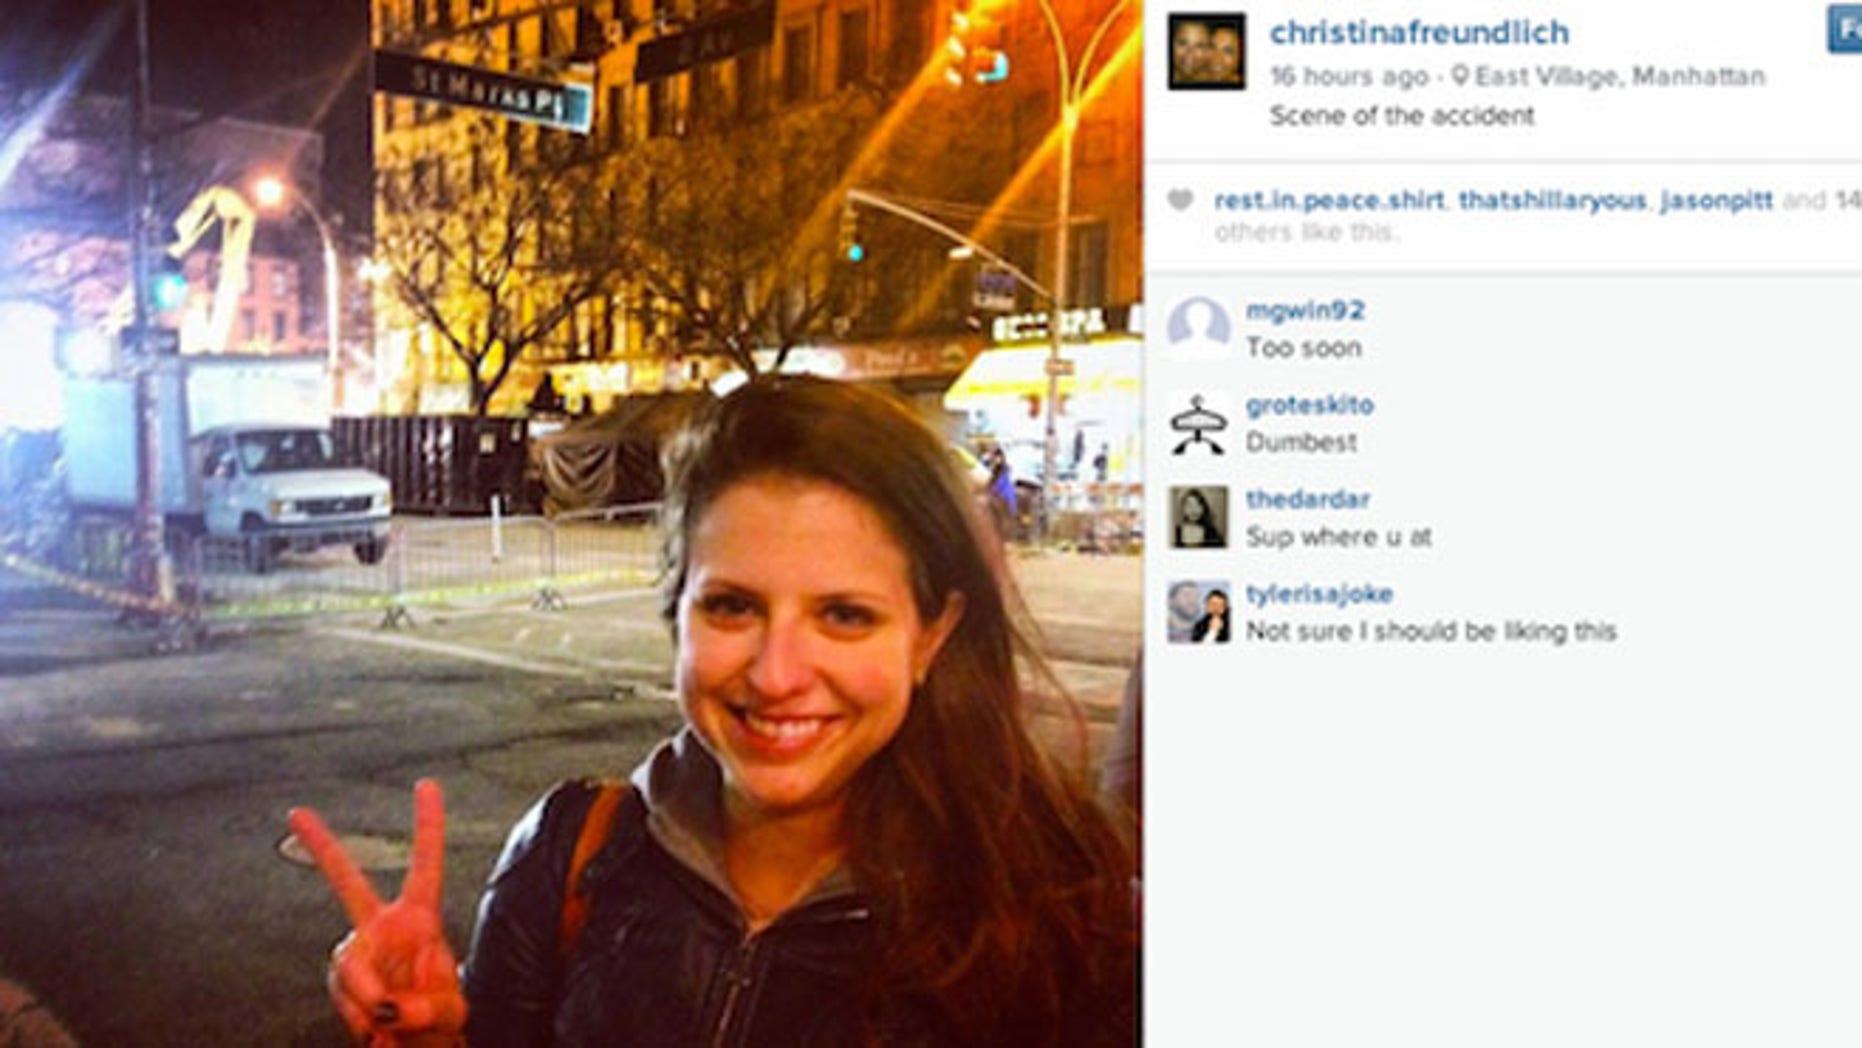 Christina Freundlich poses near East Village explosion site, via Instagram.